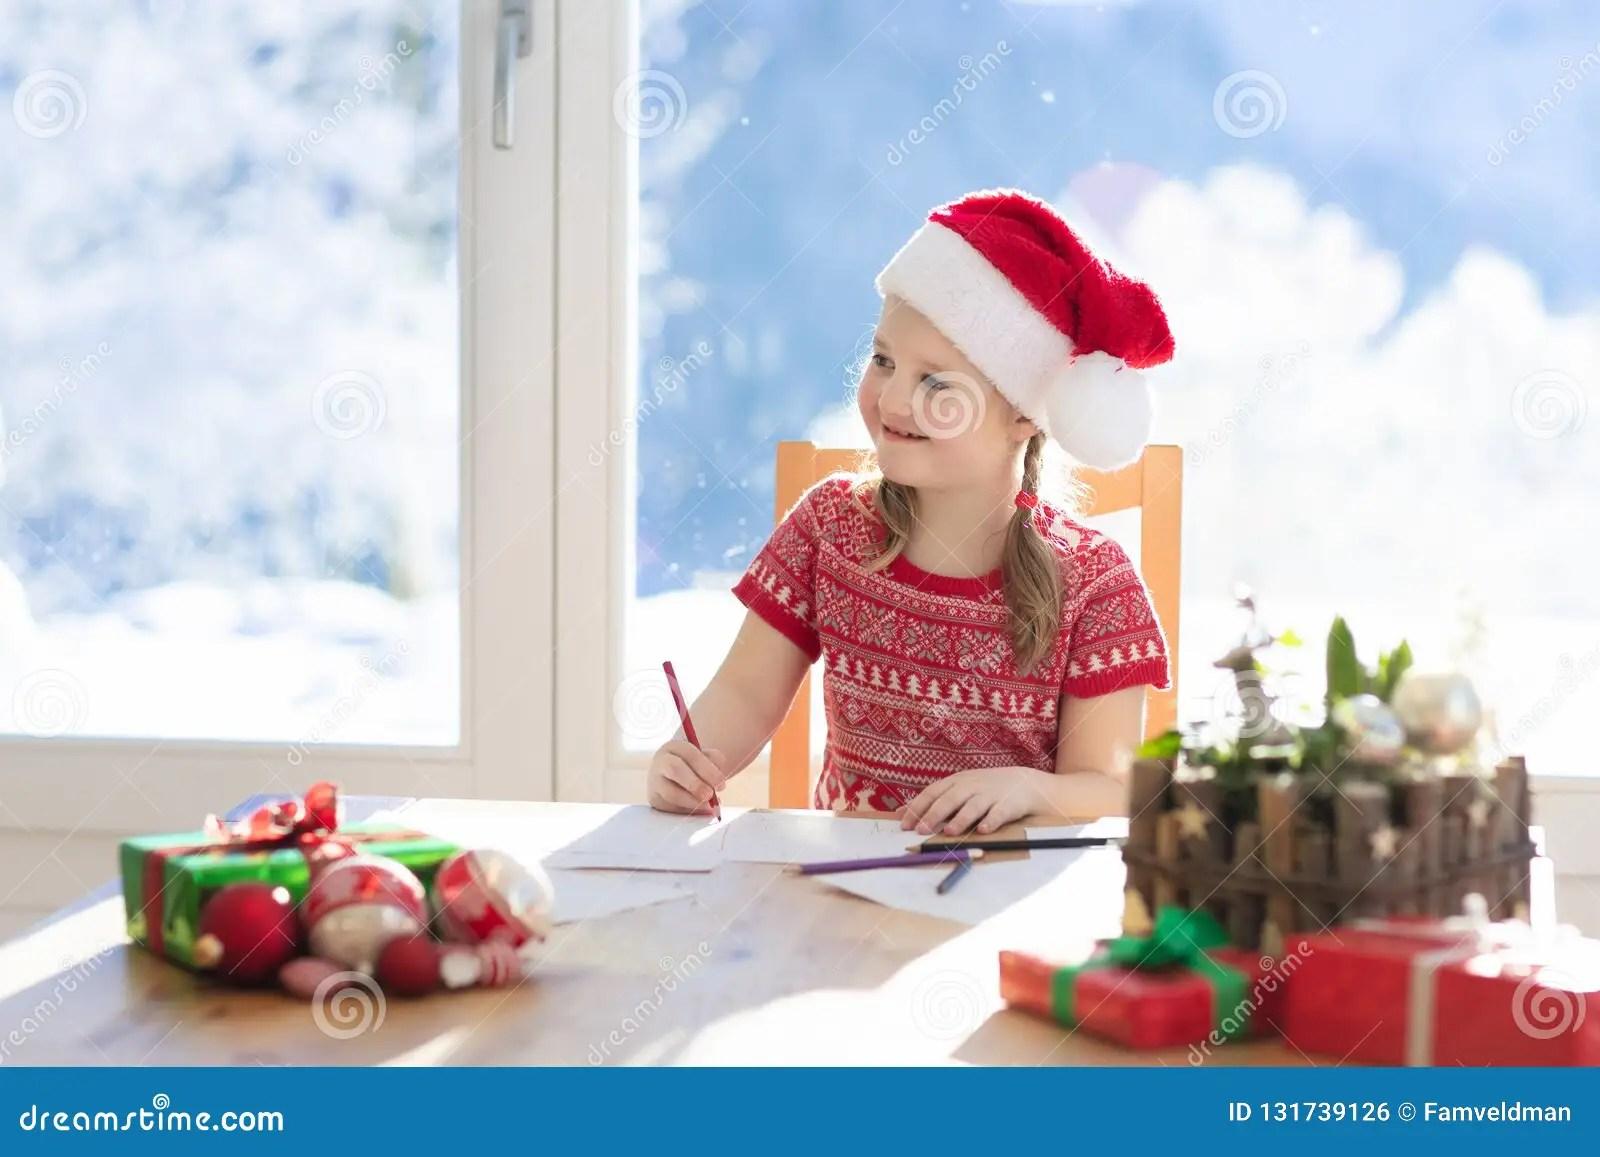 Child Writing Letter To Santa On Christmas Eve Kids Write